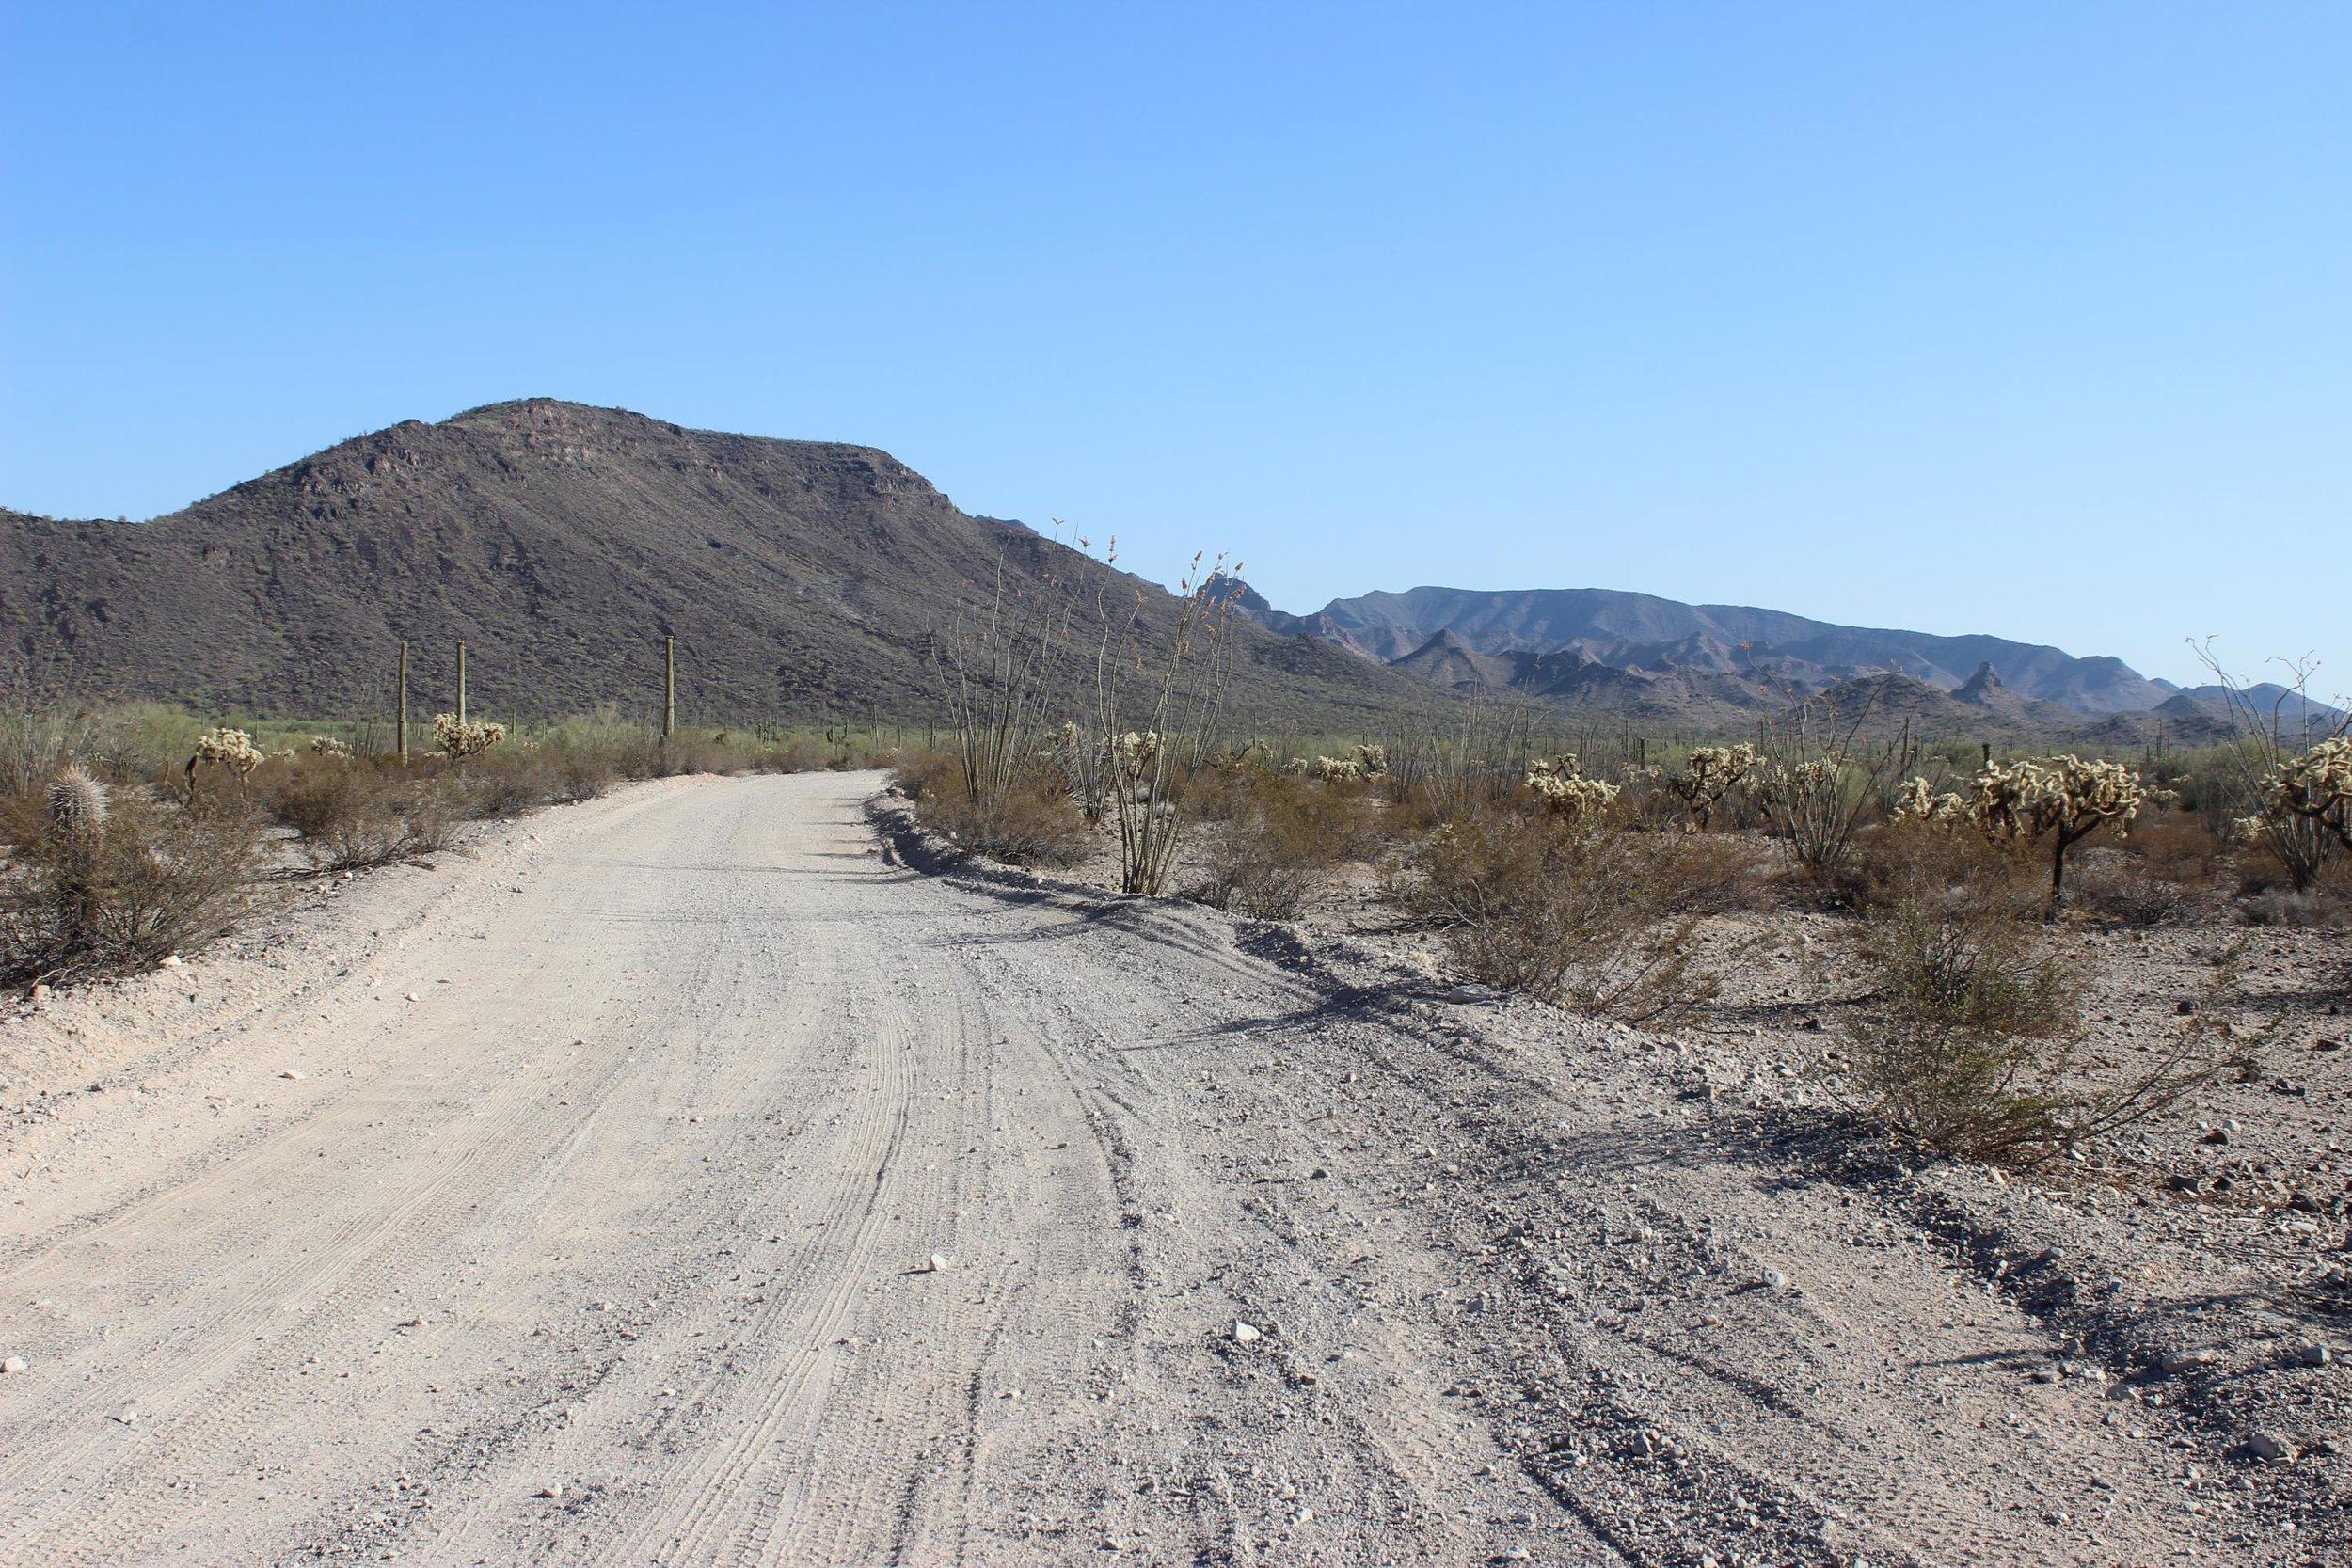 El Camino heading south towards the Bates Mountains